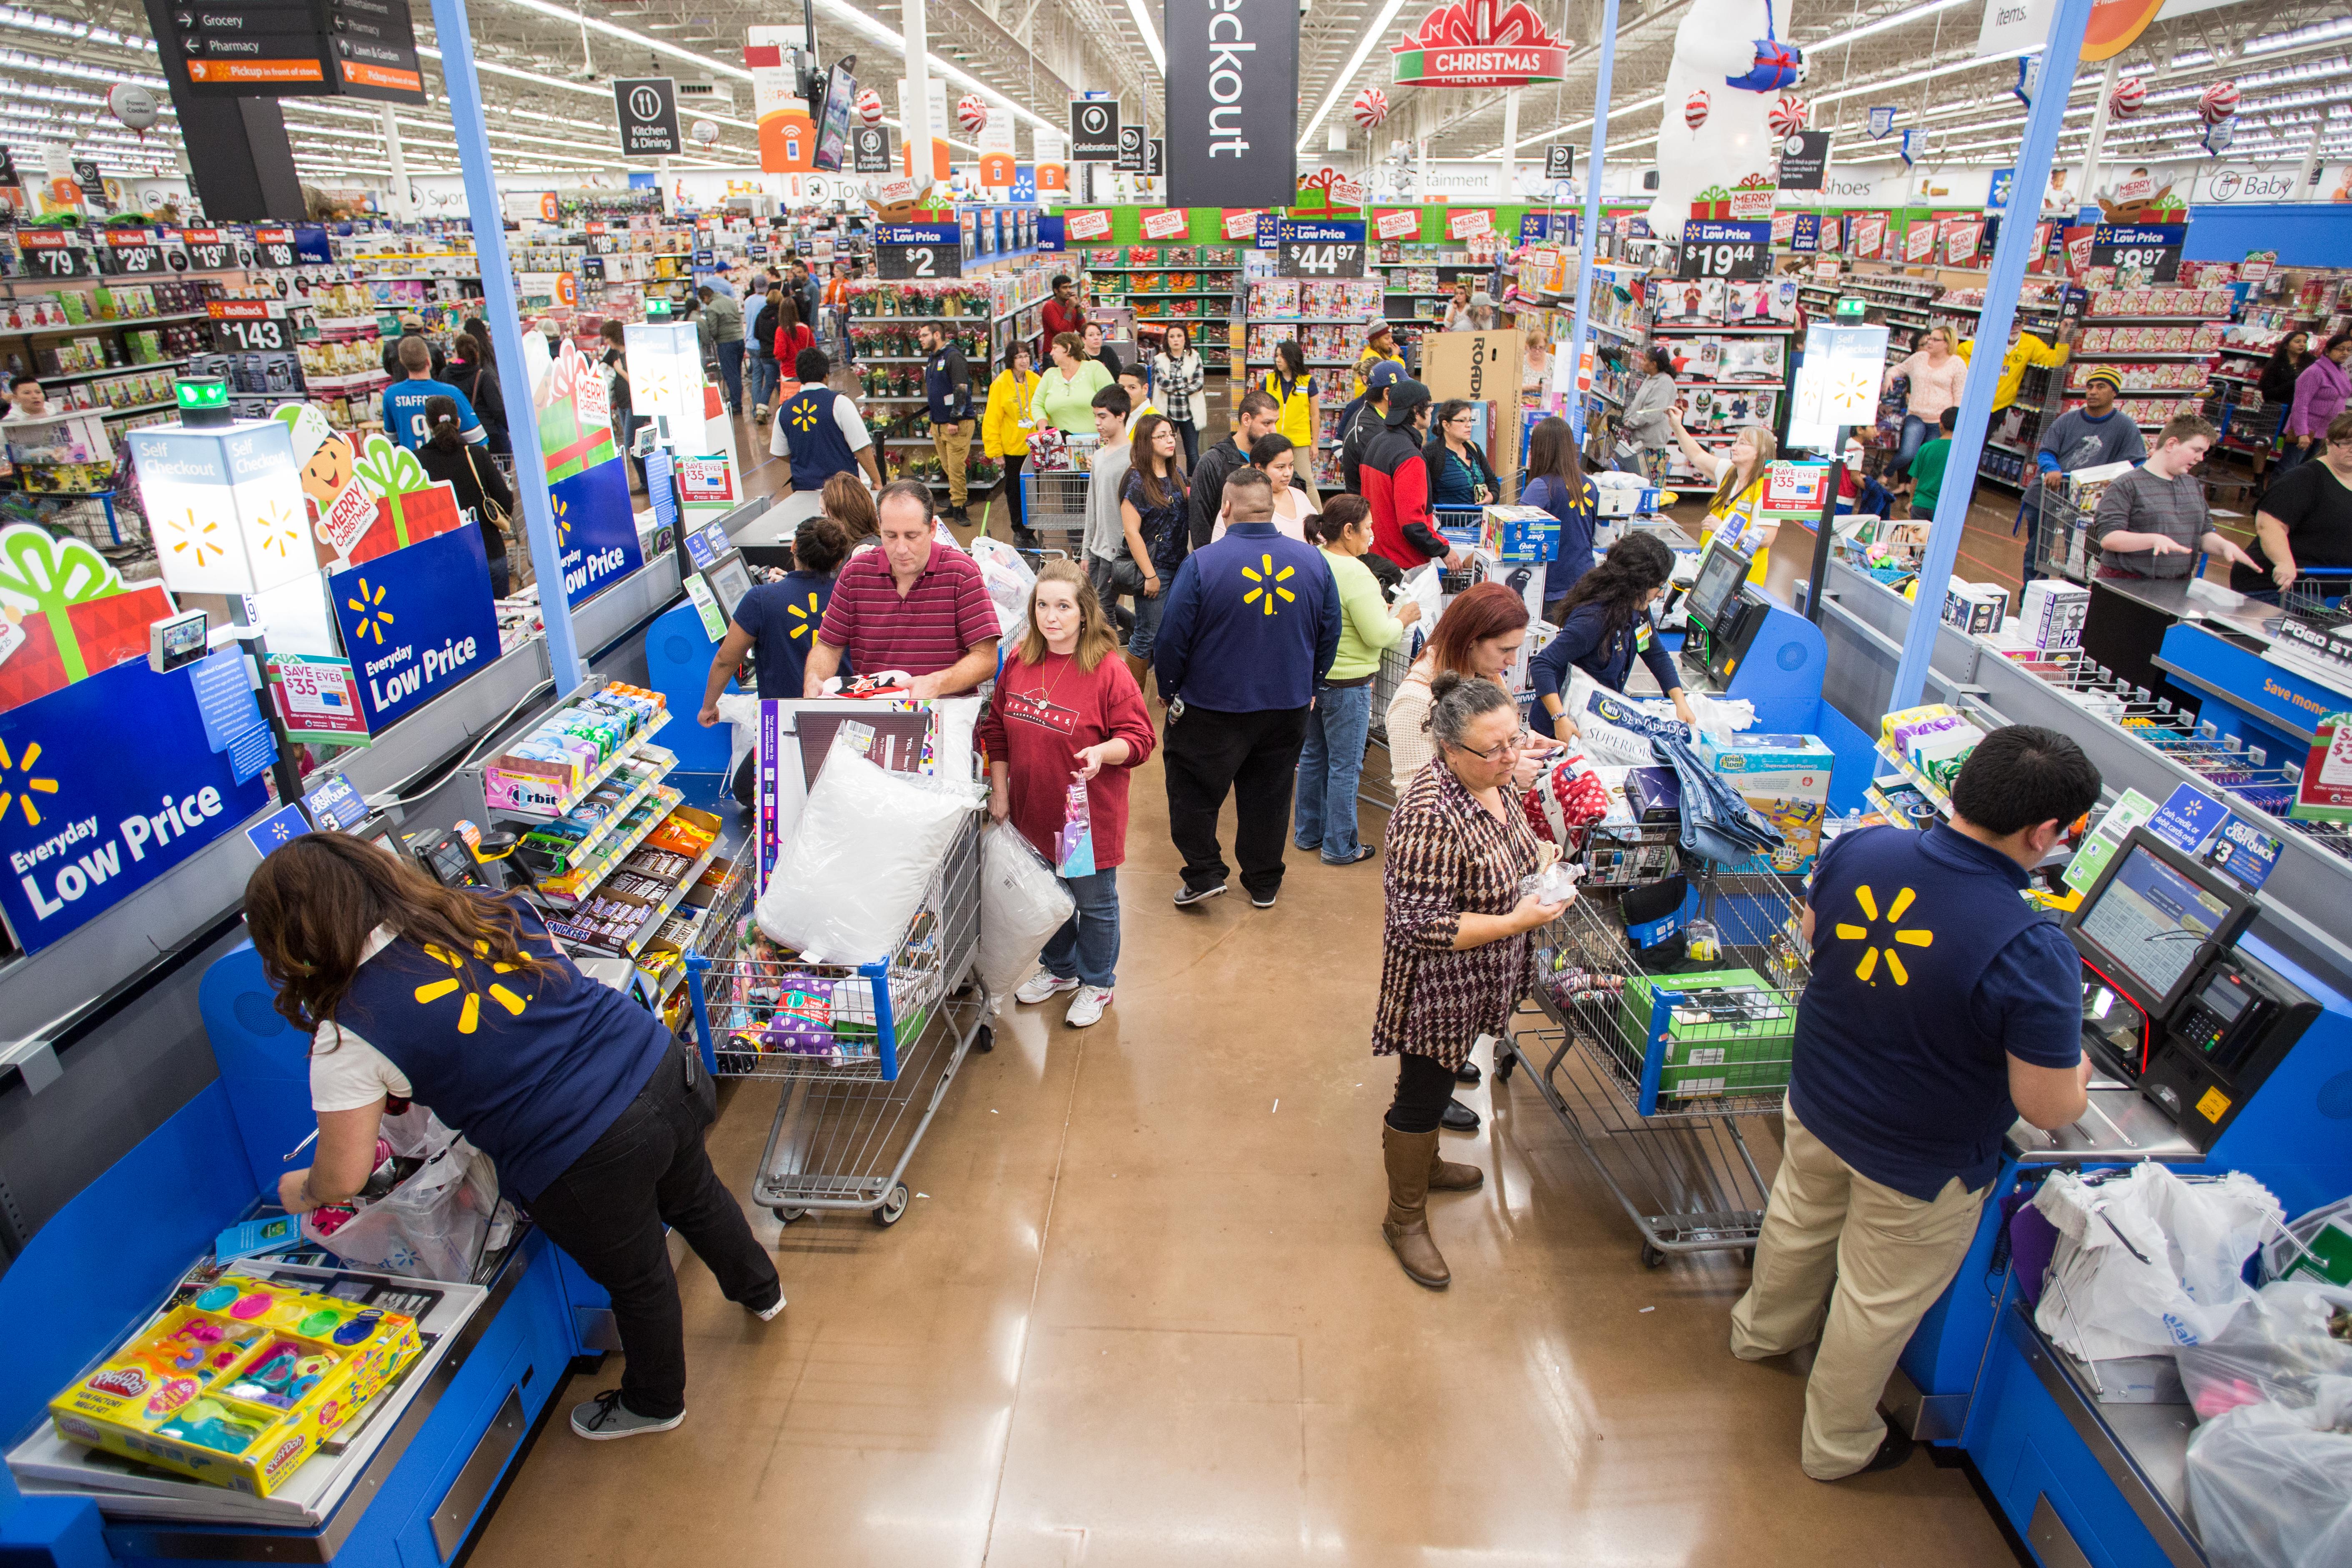 Walmart Wants a Piece of Amazon's Blockbuster Advertising